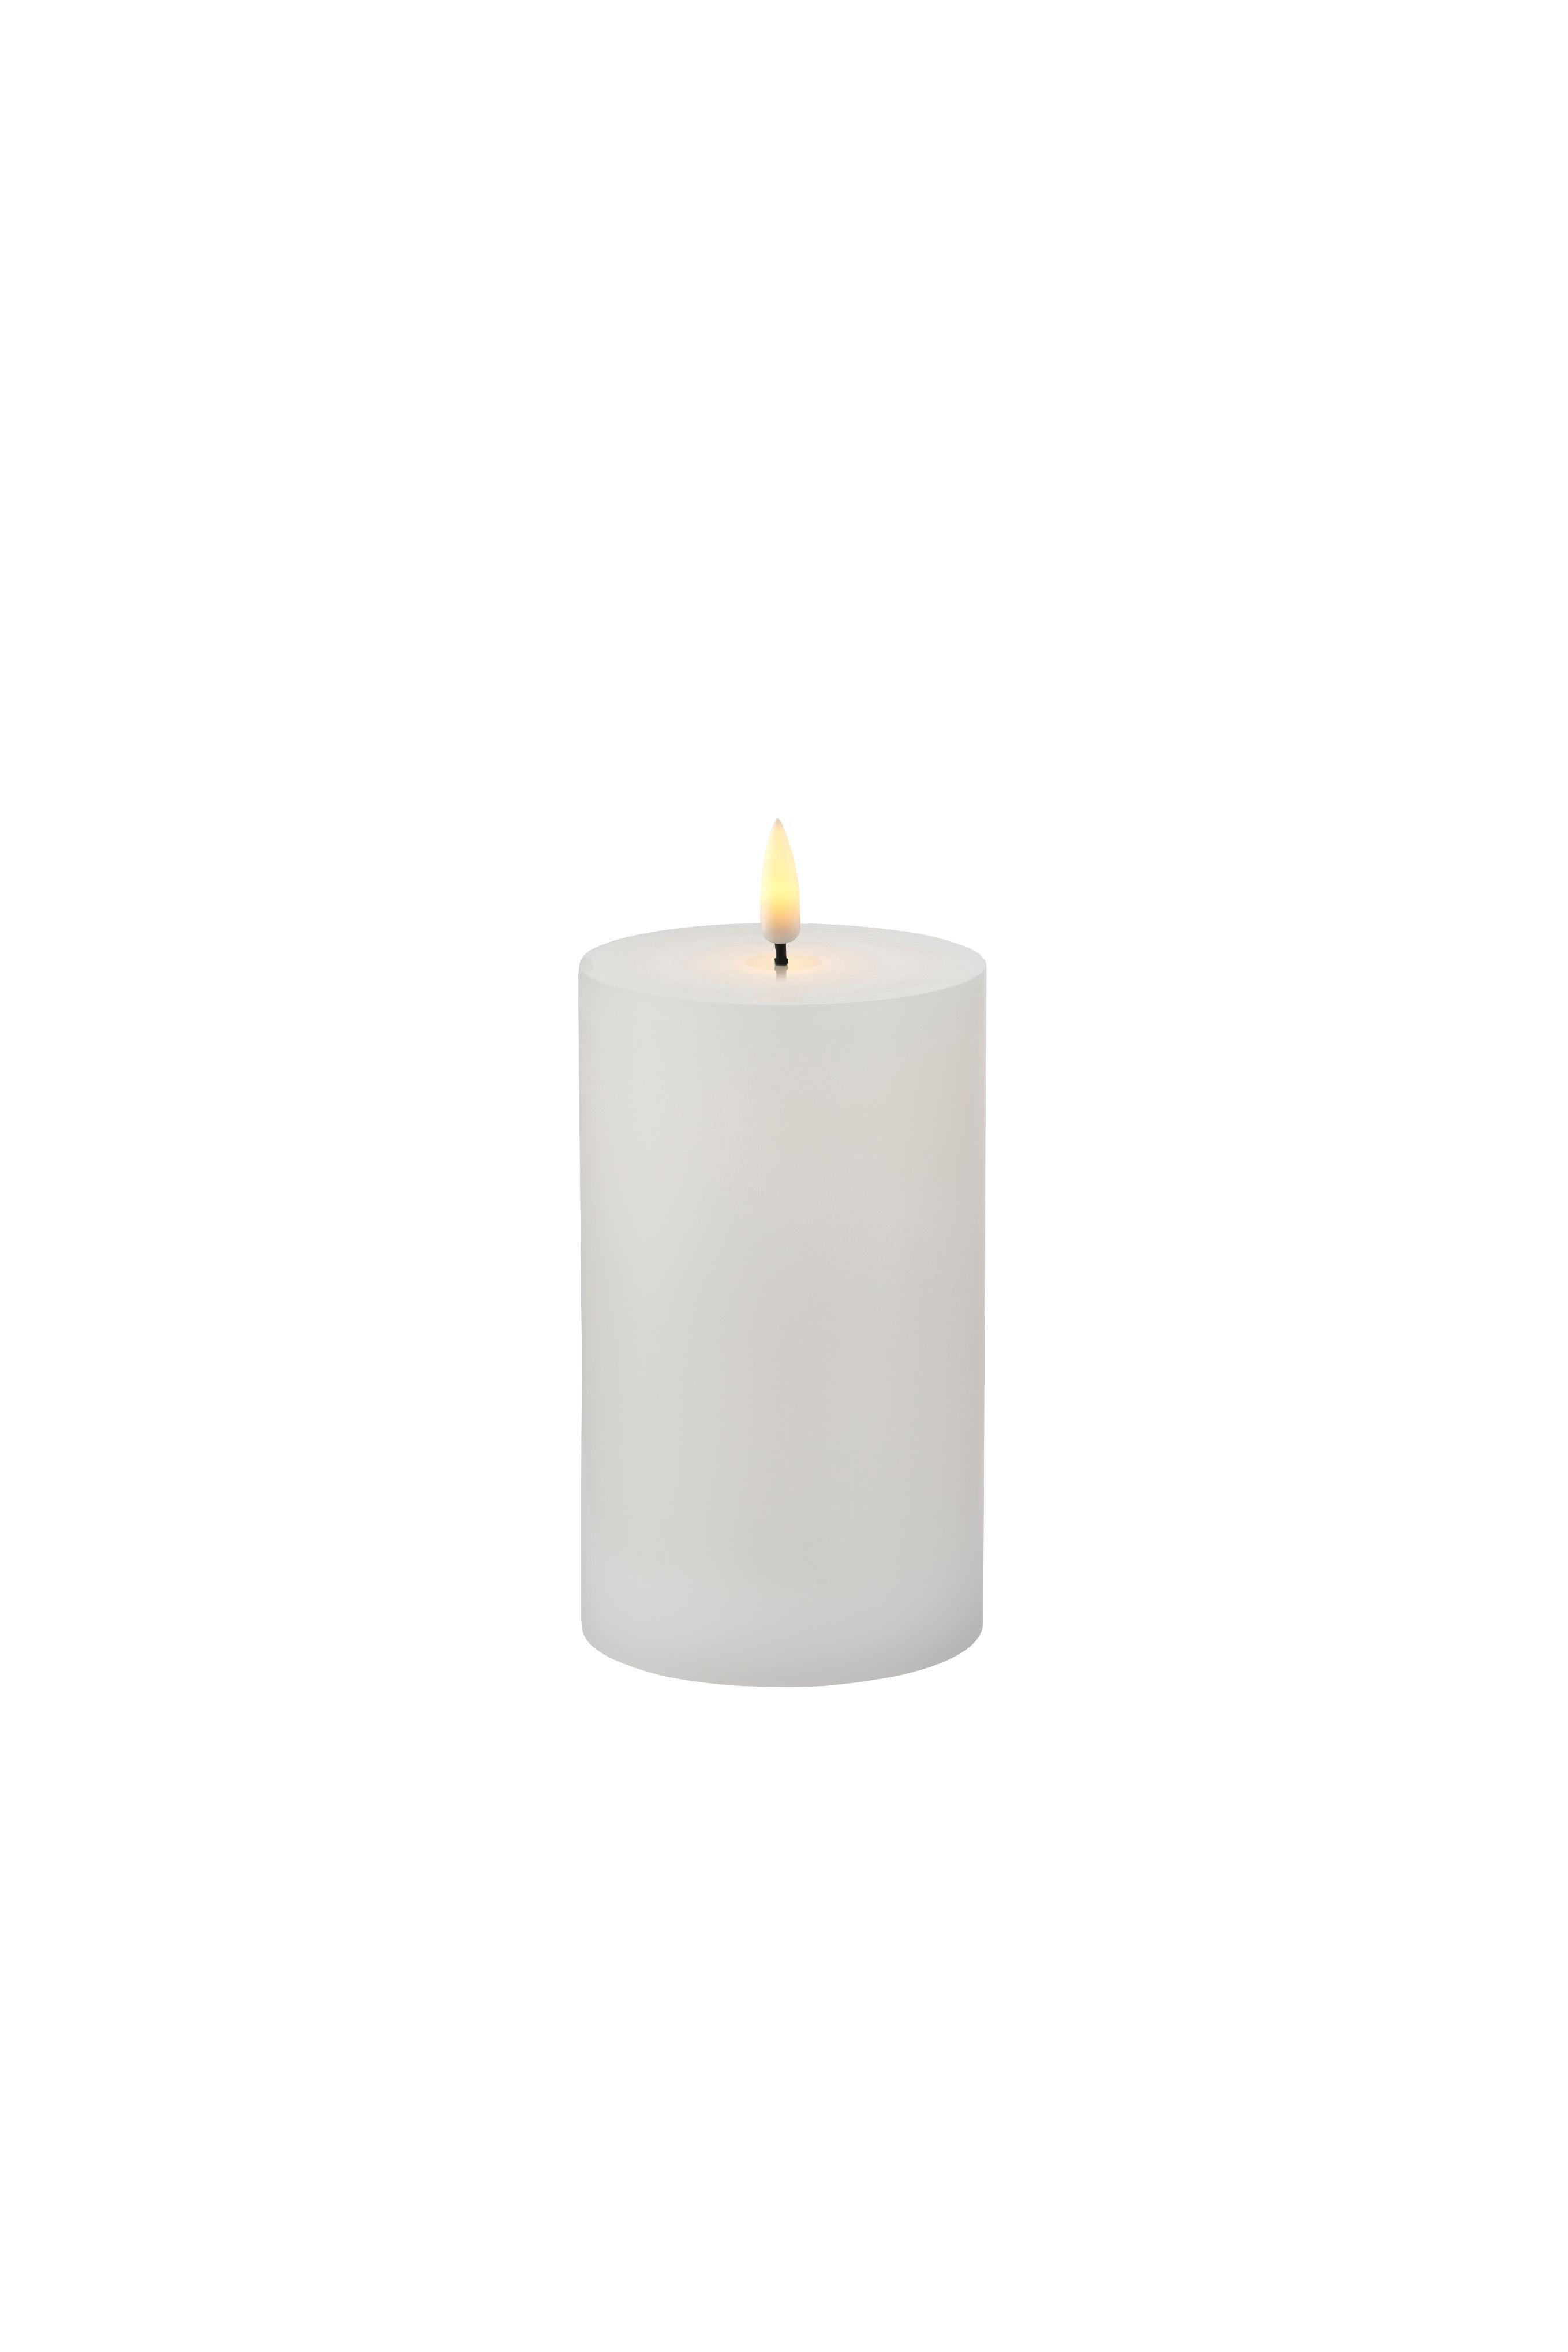 Sirius Sille genopladelig lys, 7,5x12,5 cm, hvid